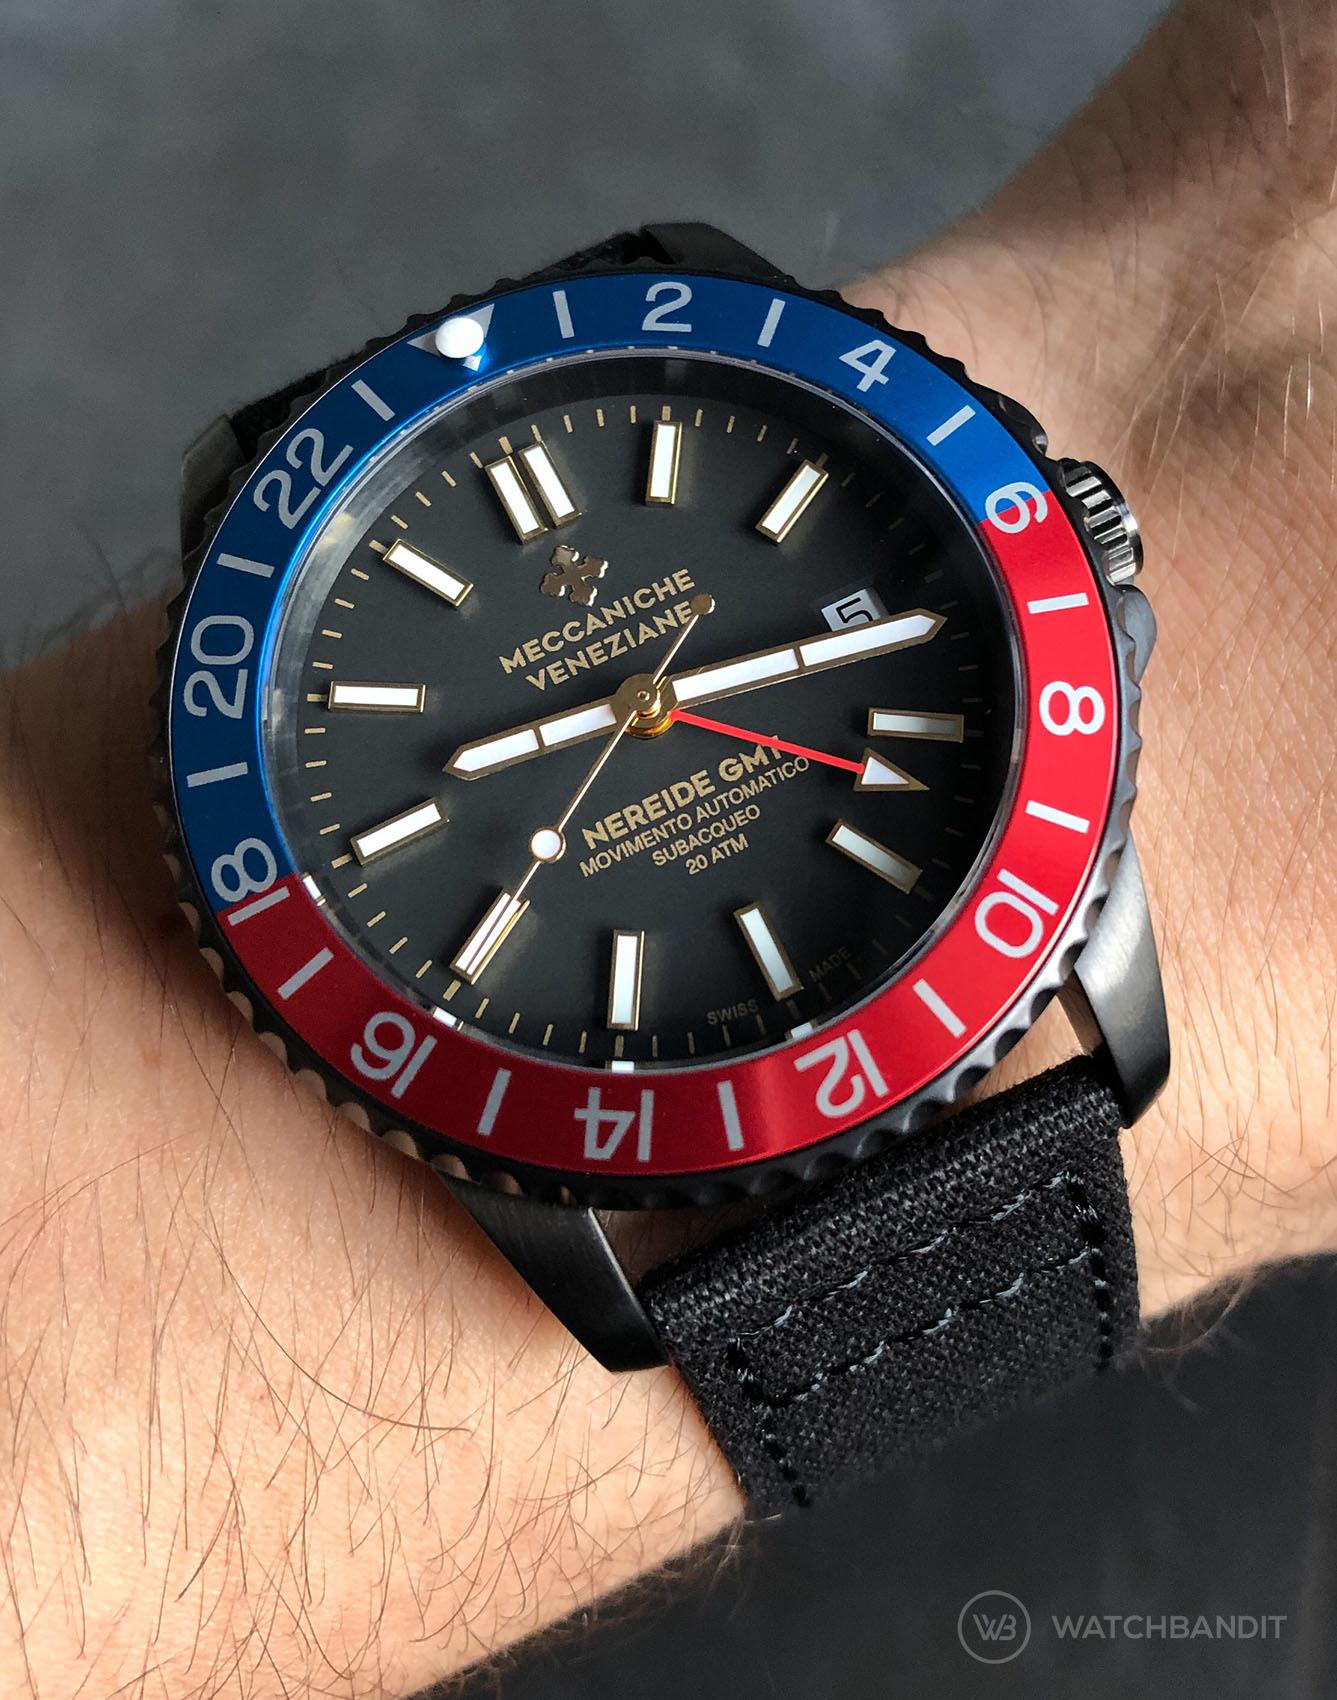 Meccaniche Veneziane Nereide Pepsi GMT Diaspro PVD Watchbandit black Canvas strap